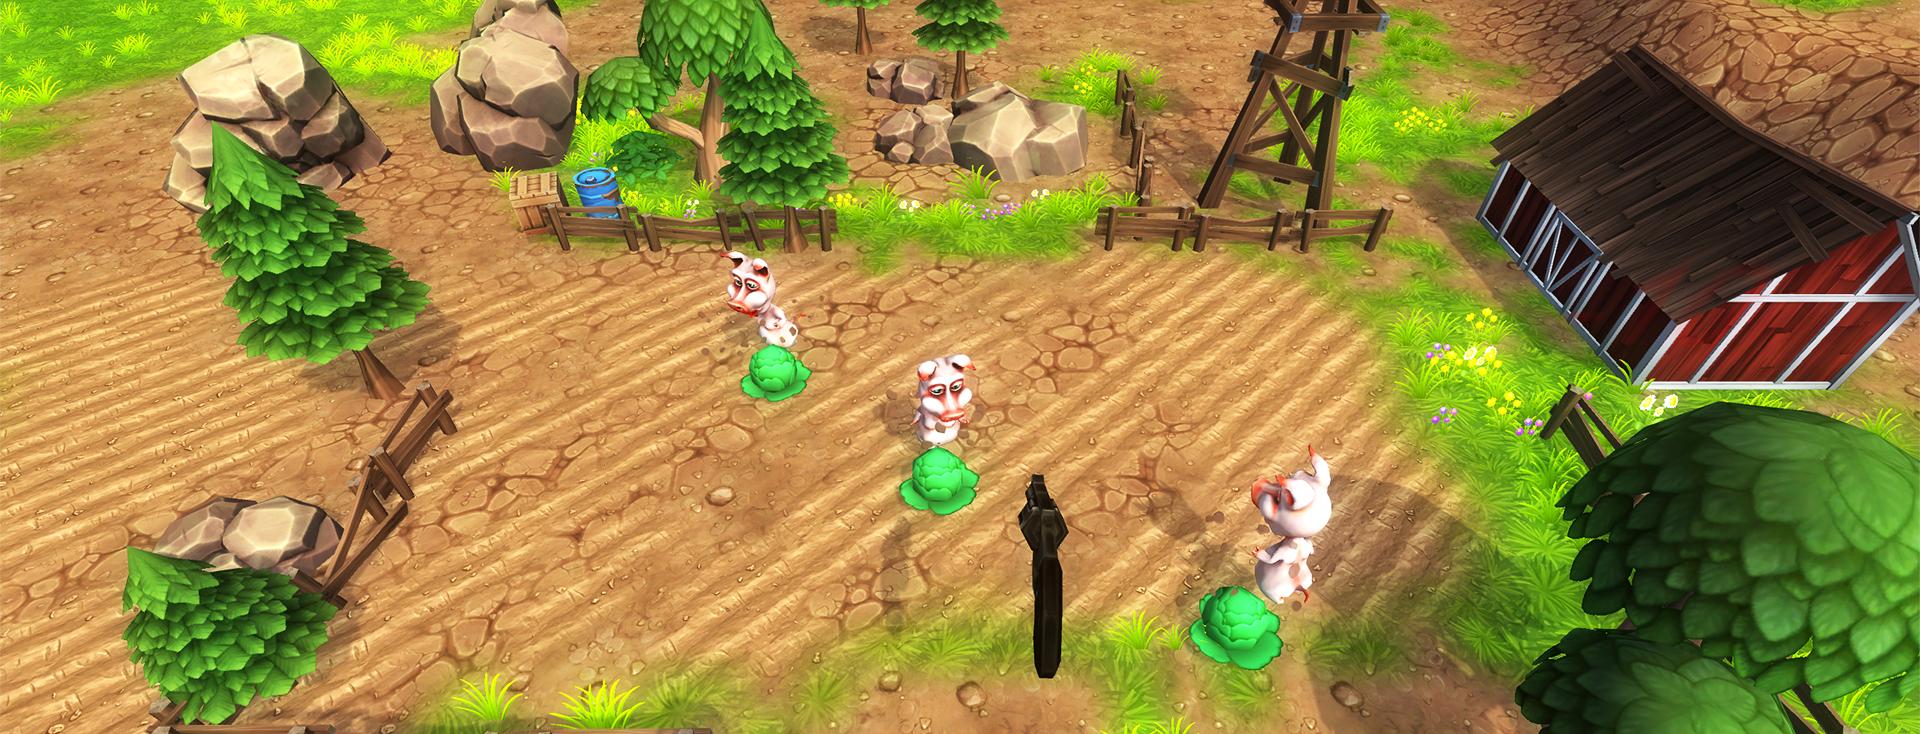 Mushroom-Farm-Slider-Game-2